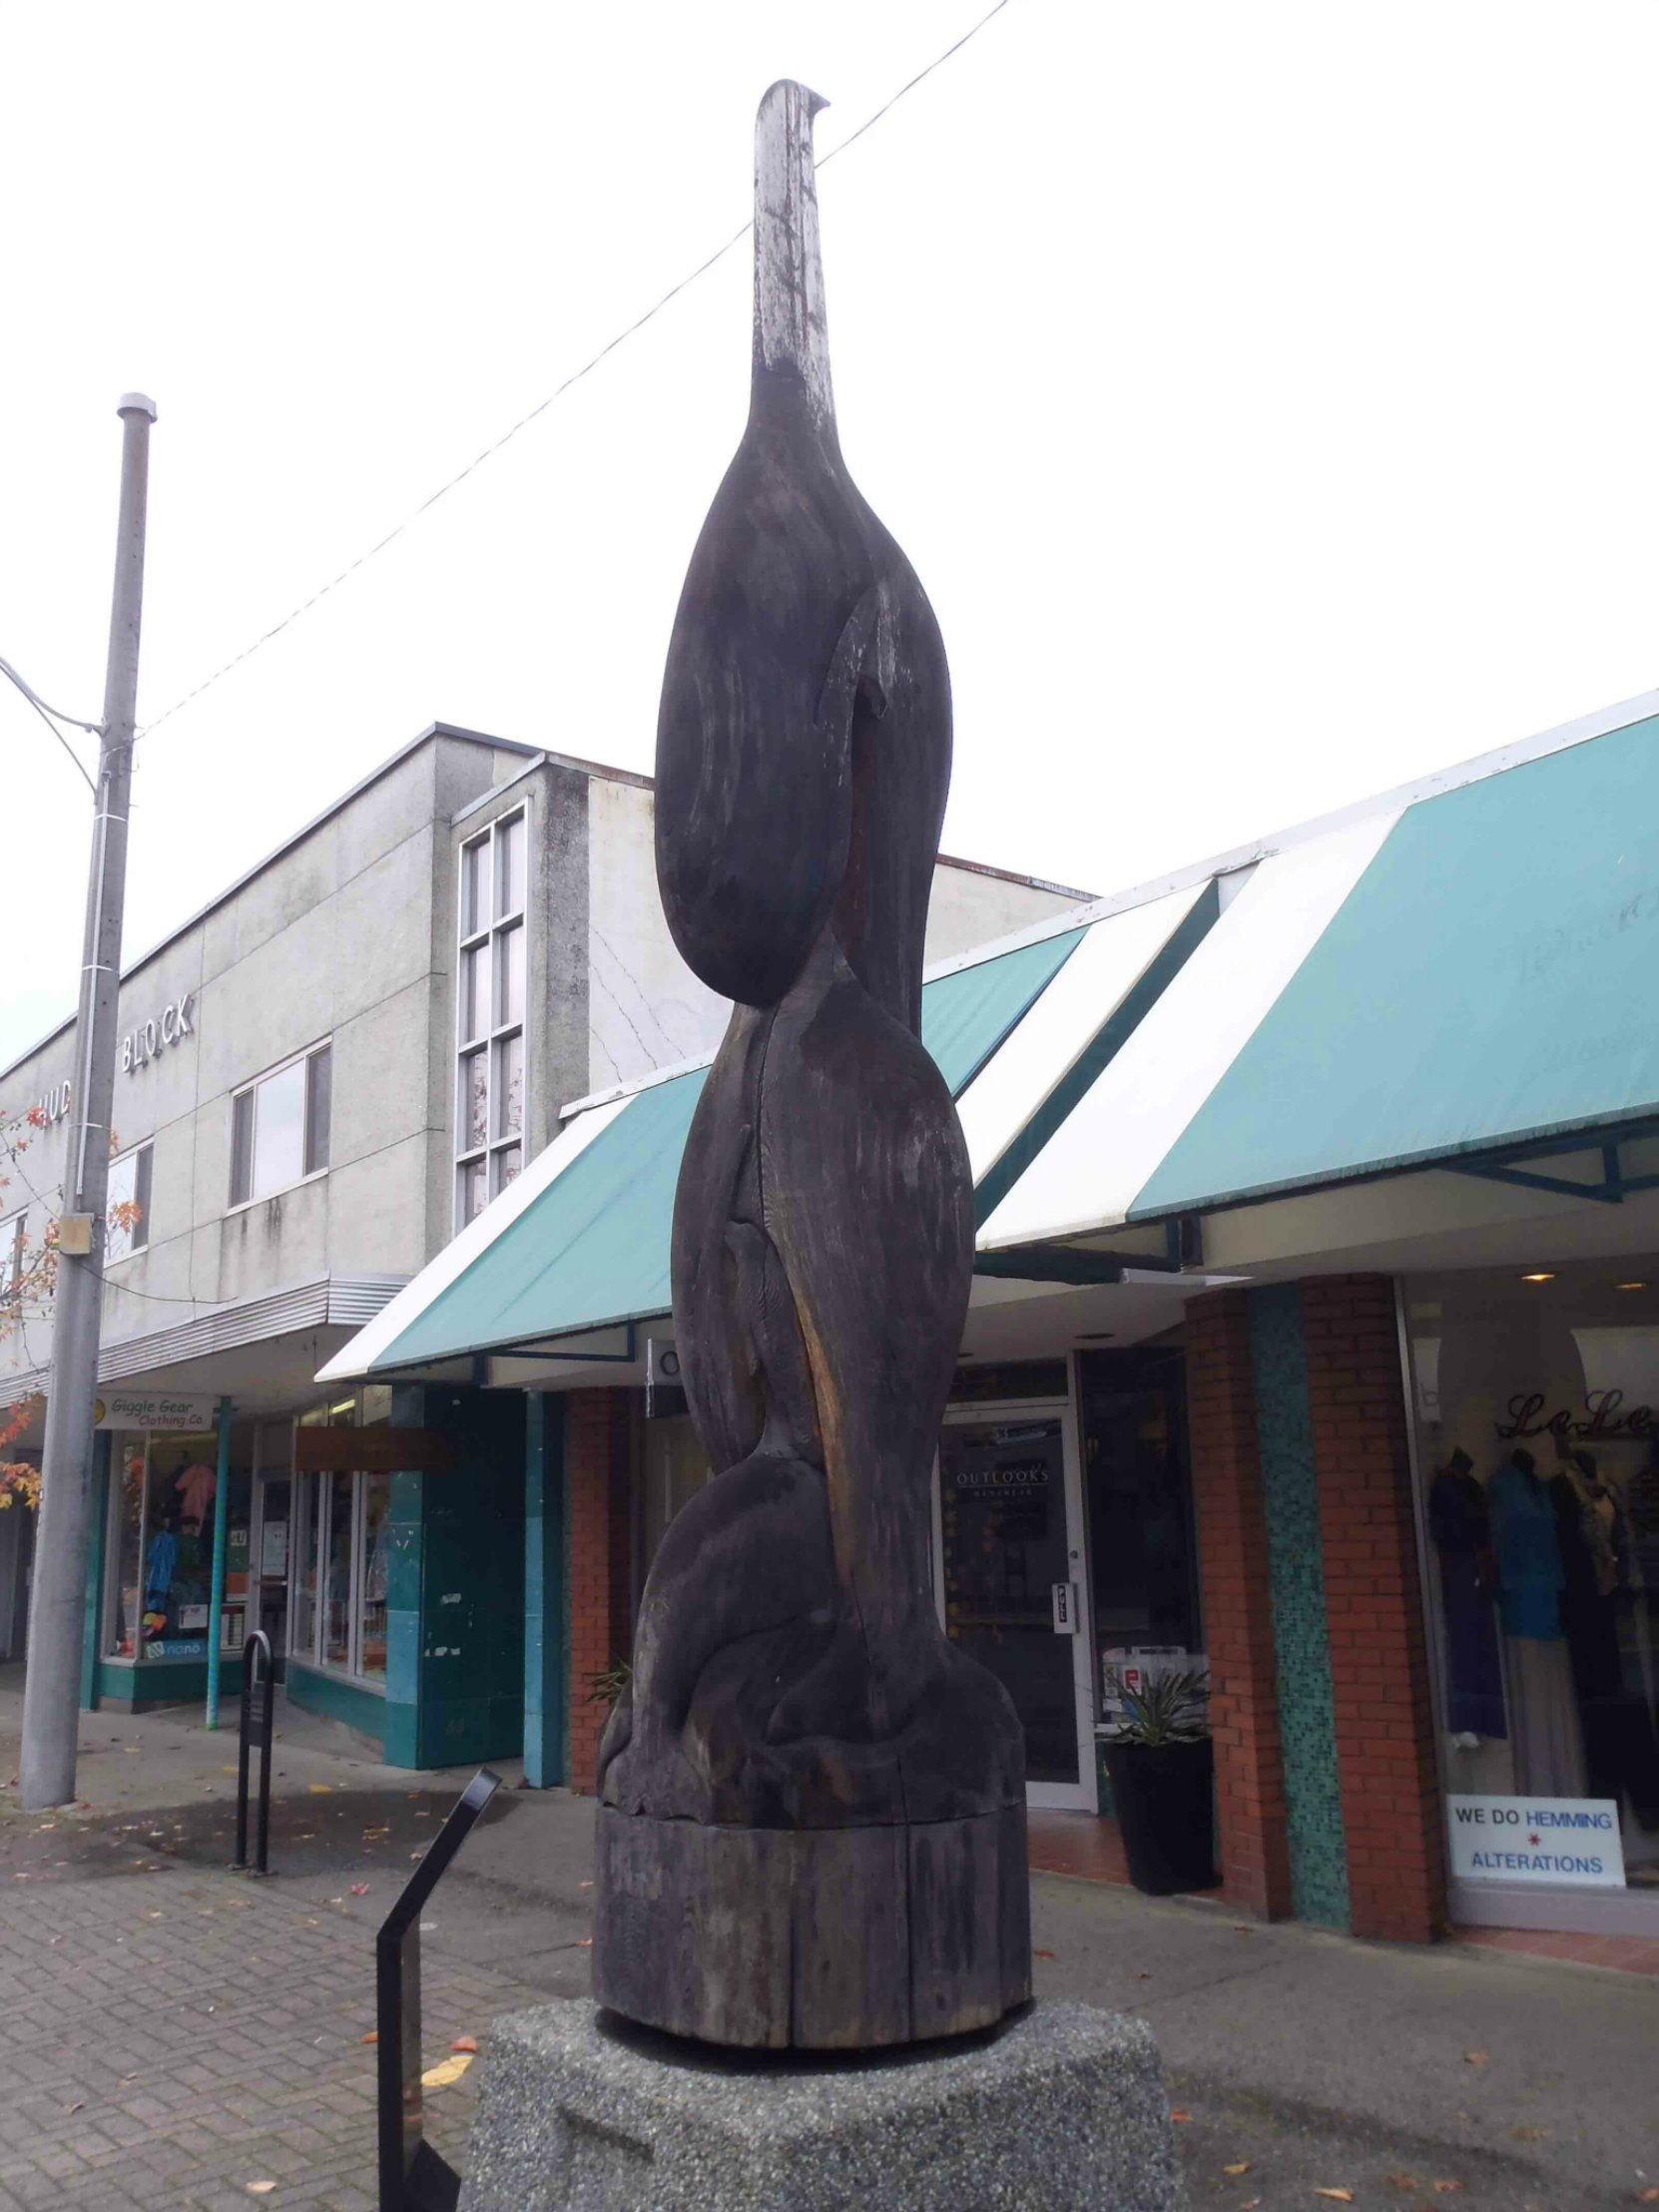 Transition totem pole, Station Street, Duncan, B.C.